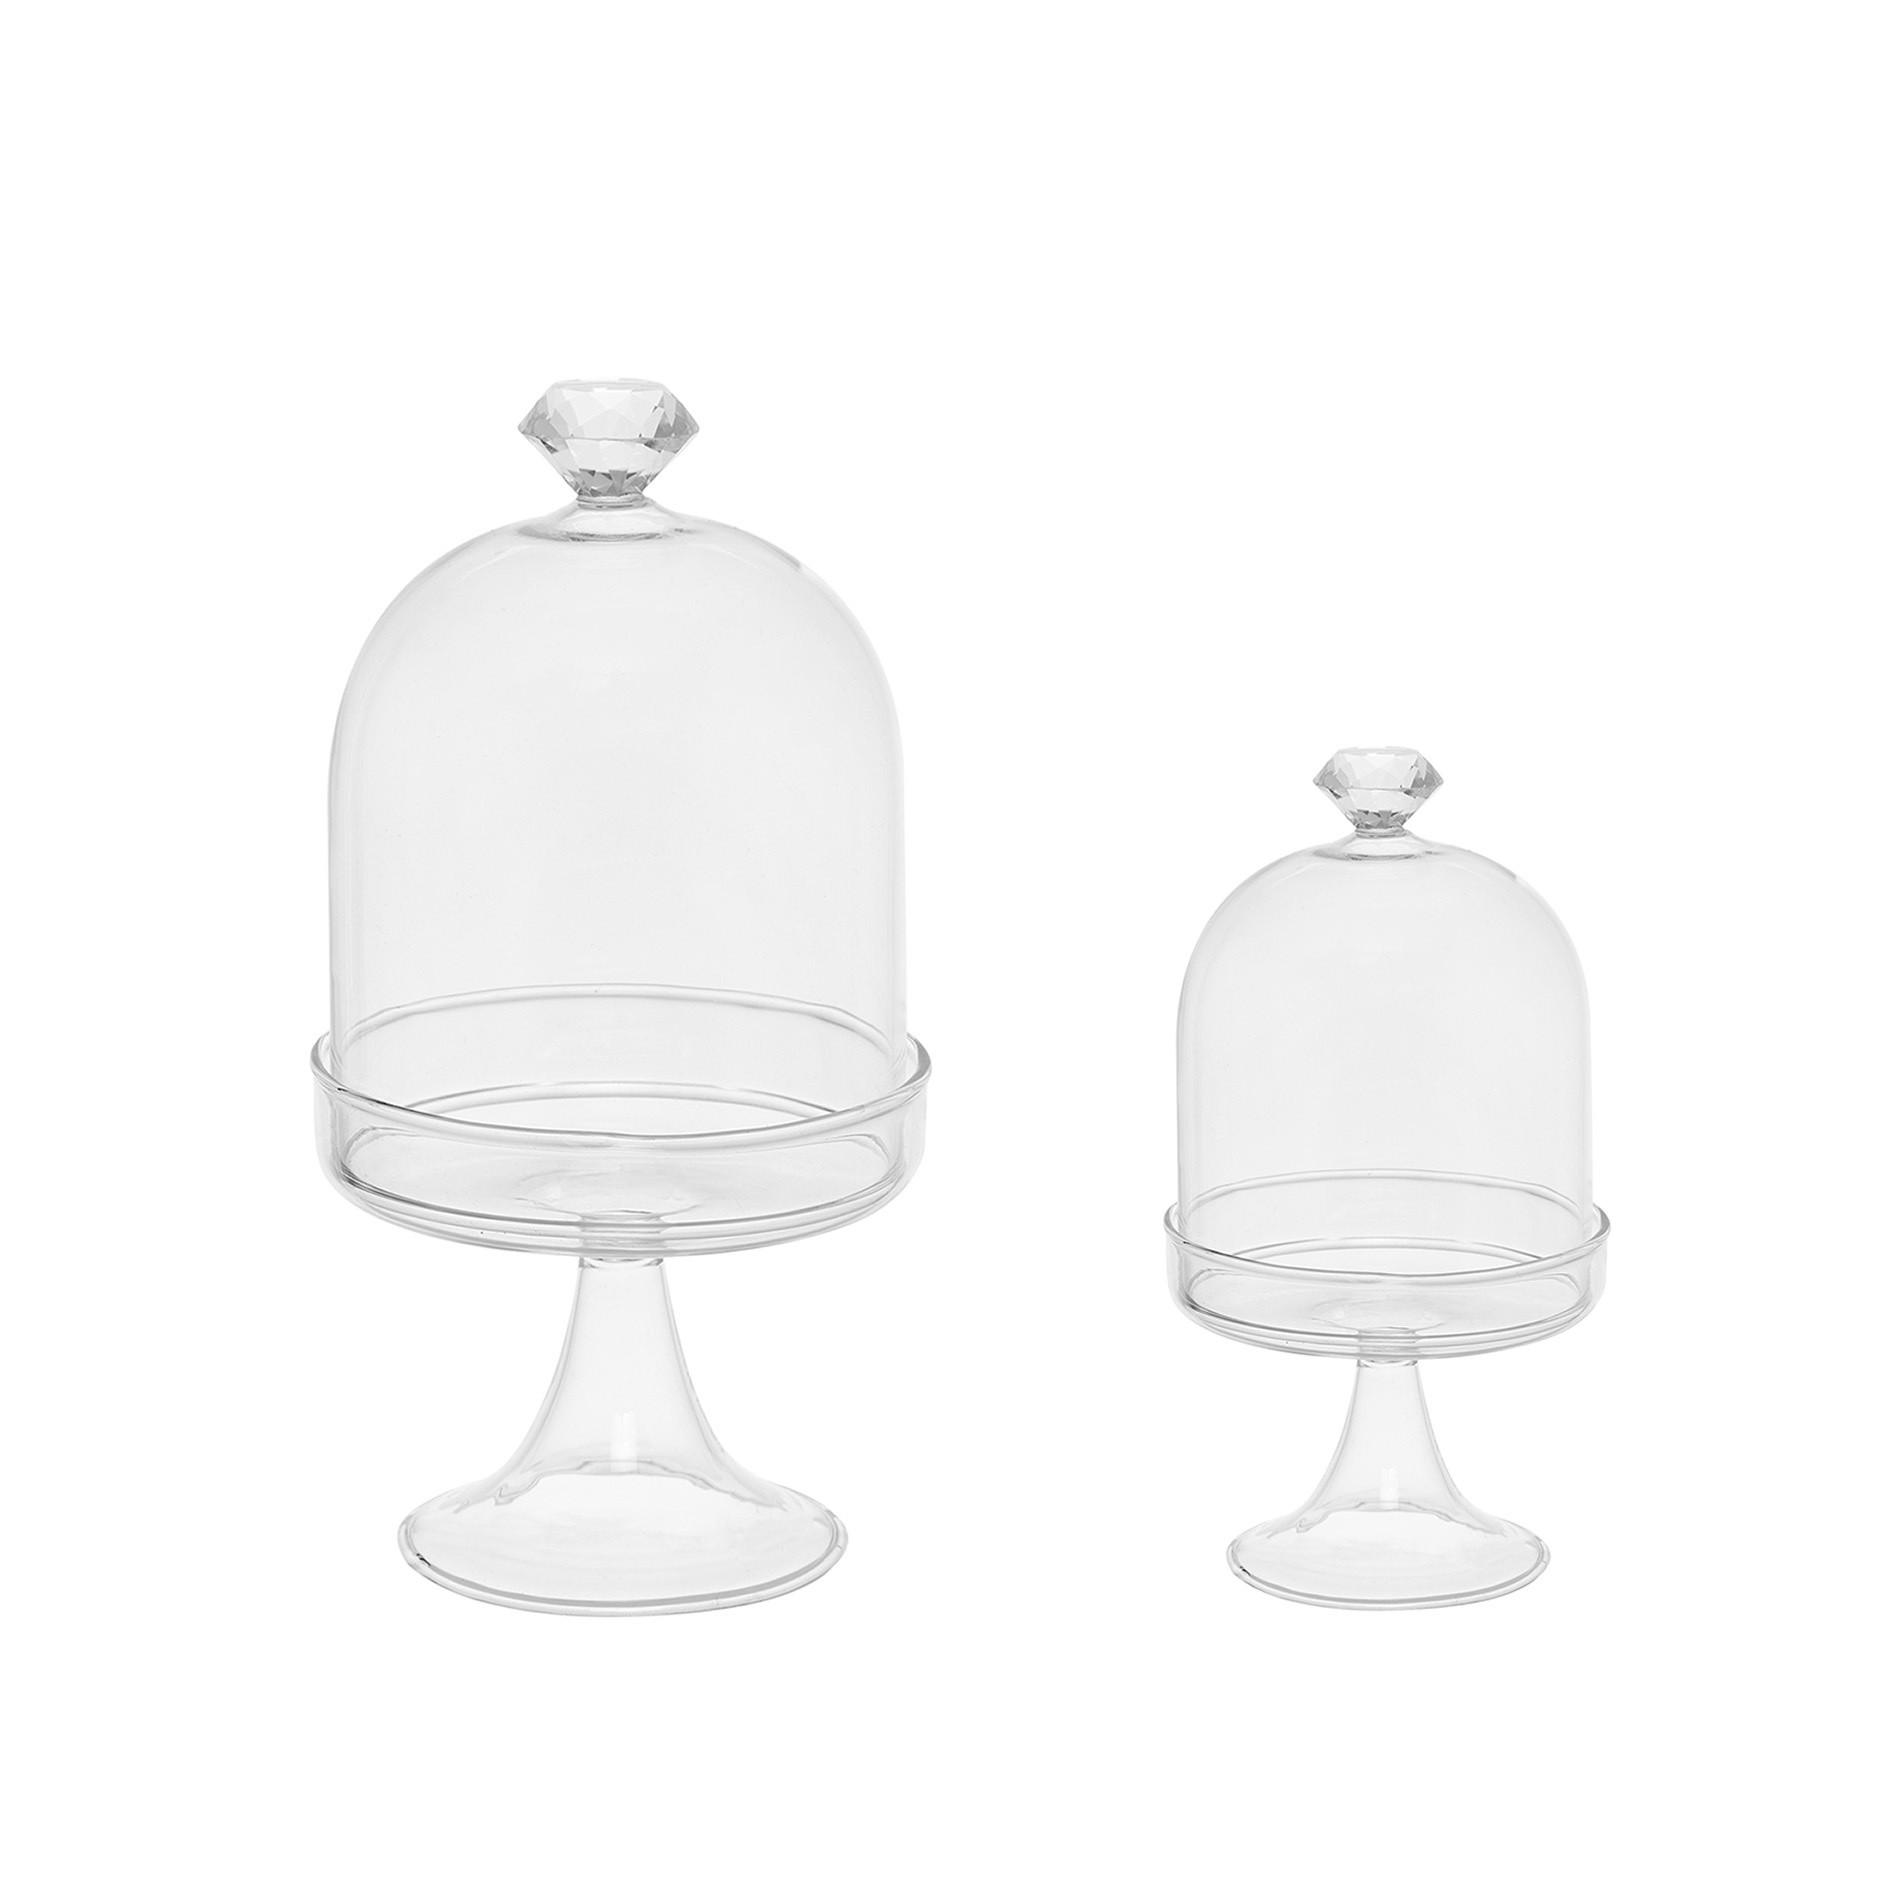 Alzata vetro con diamante, Bianco, large image number 3